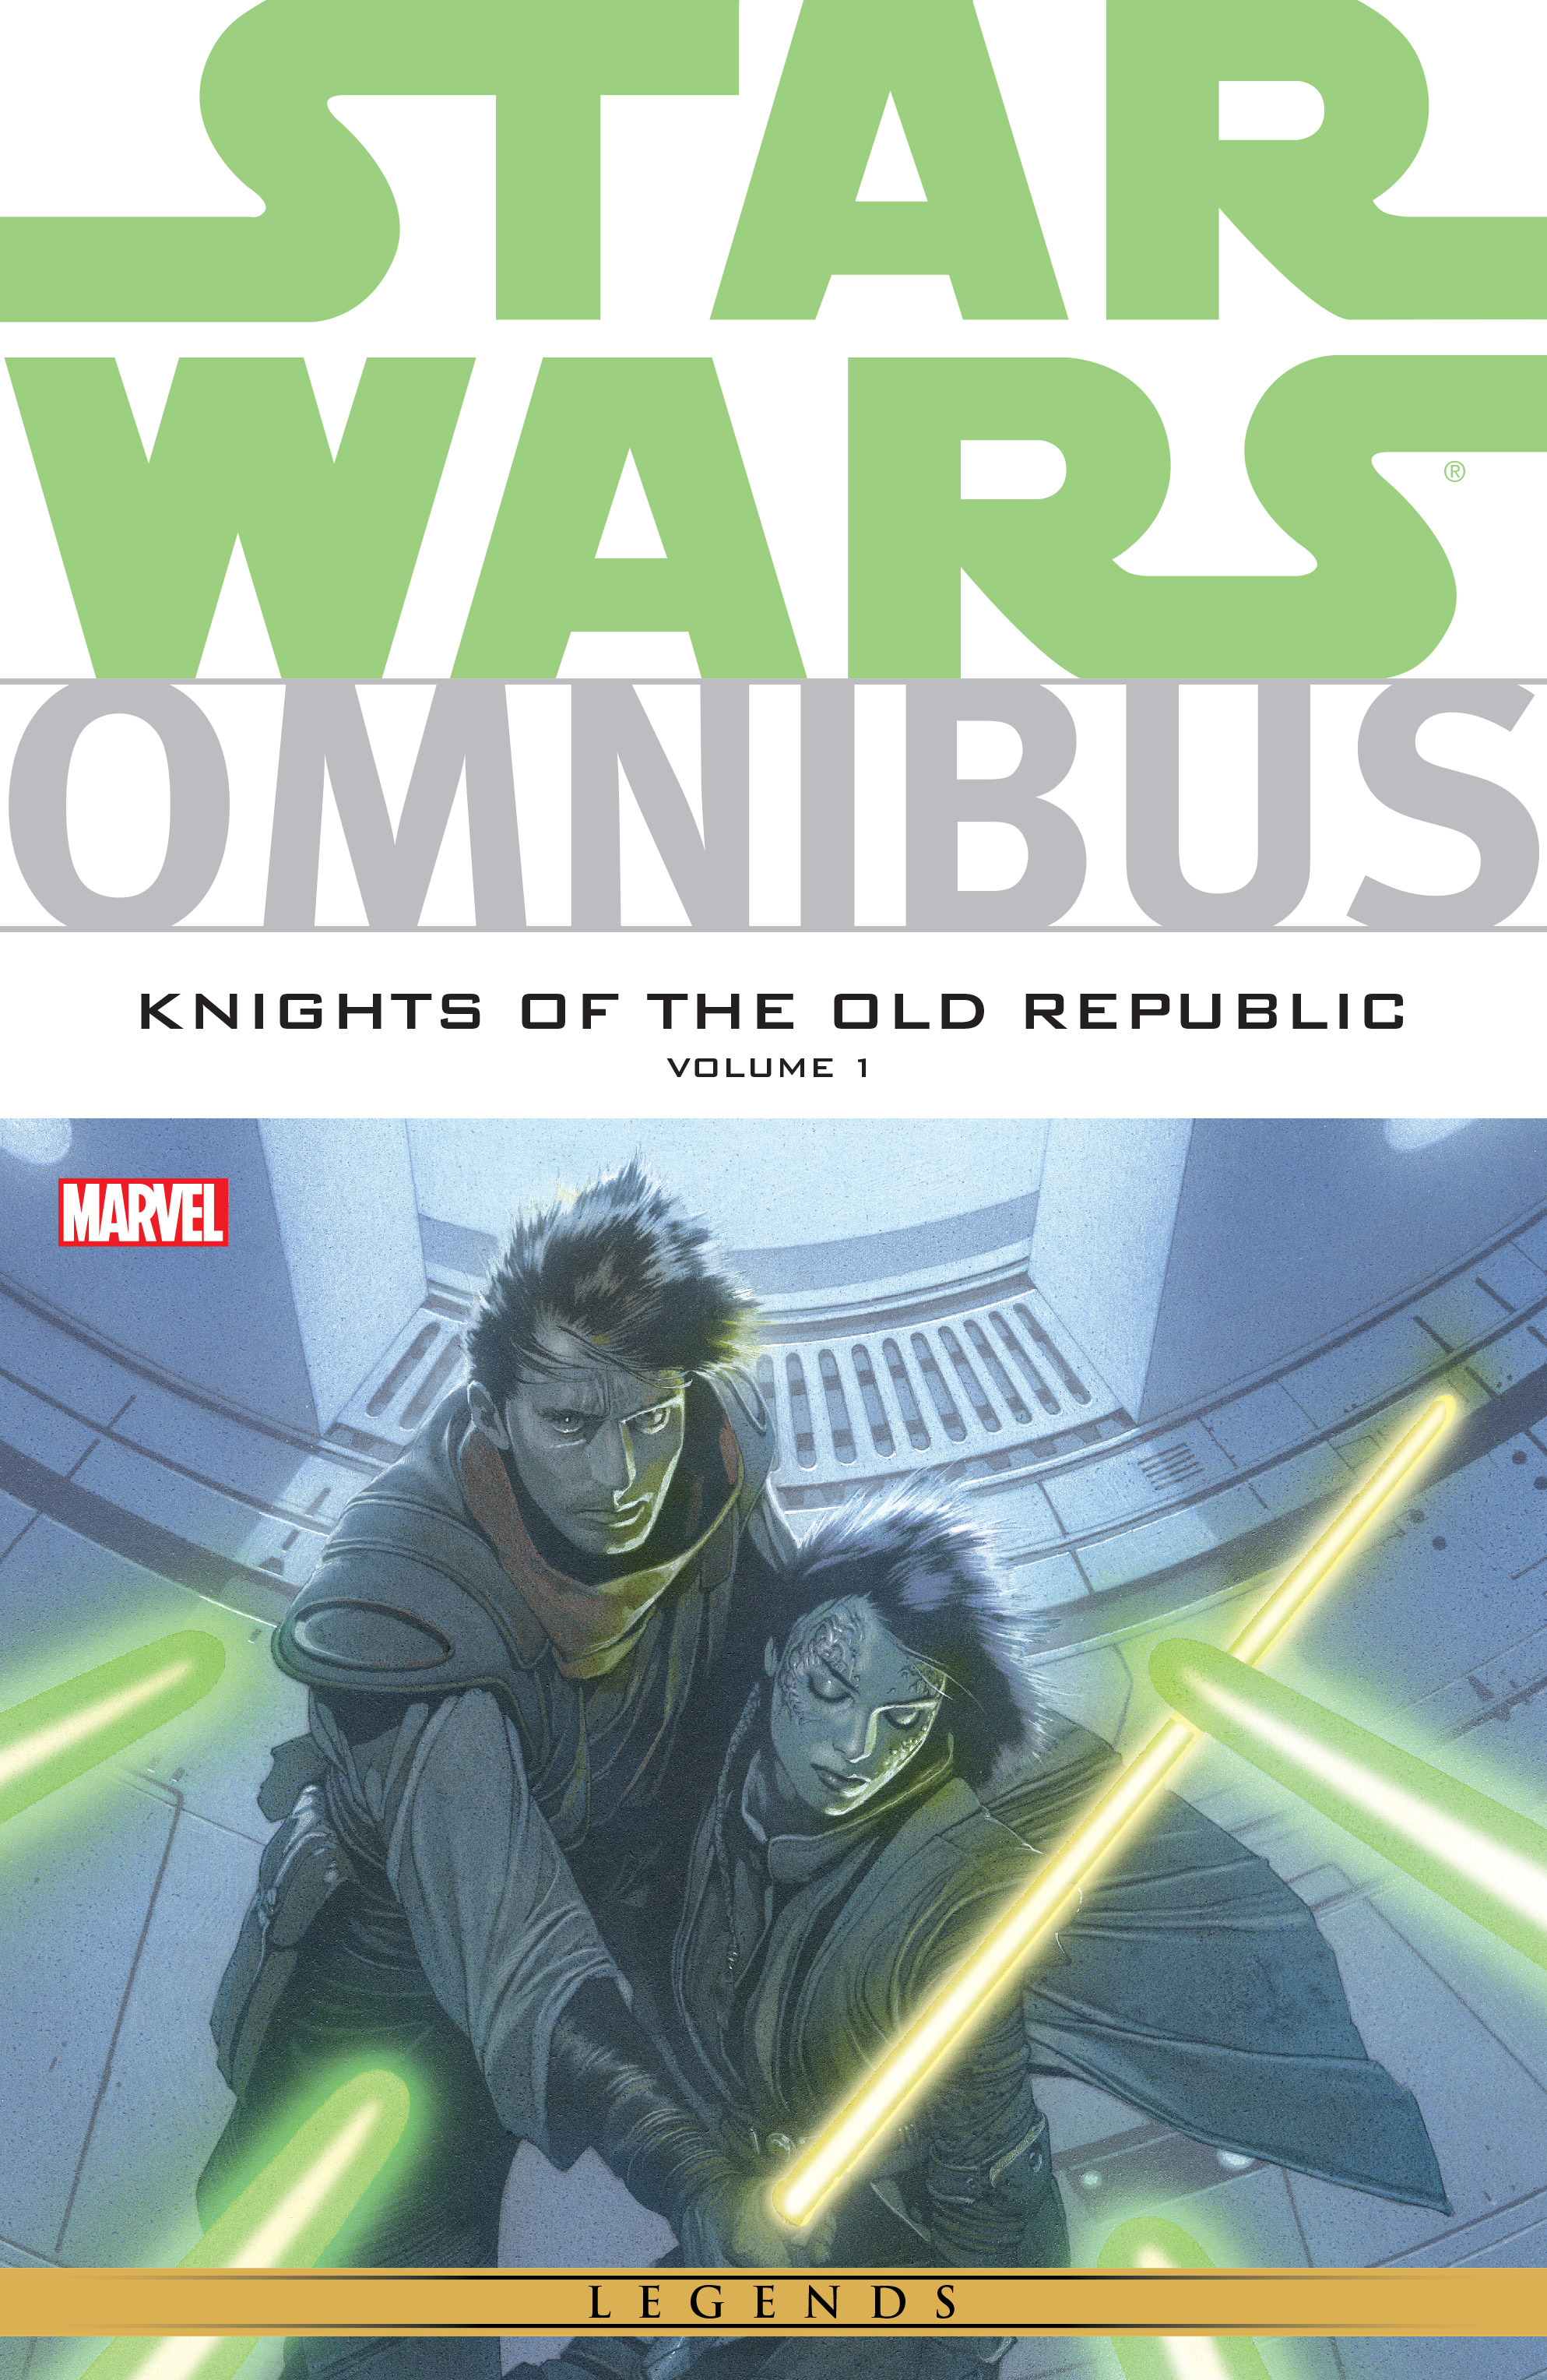 Read online Star Wars Omnibus comic -  Issue # Vol. 29 - 1